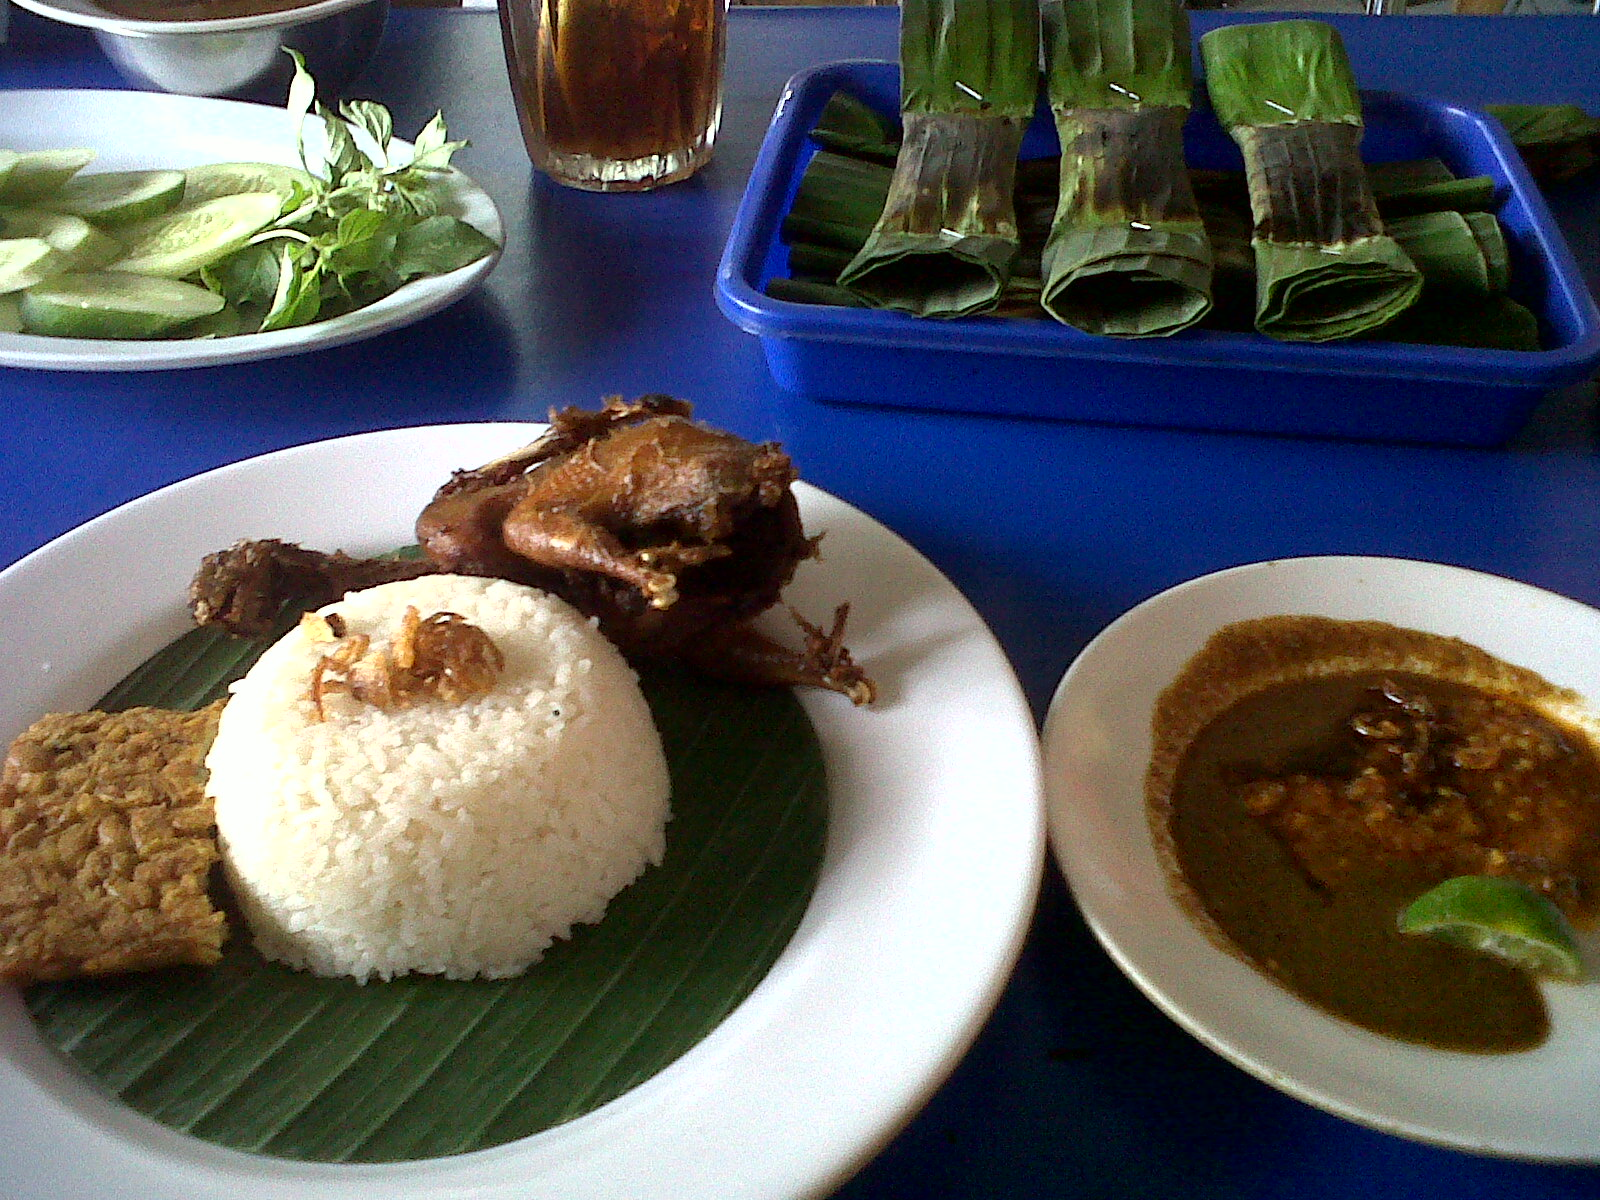 Resep soto tangkar khas betawi asli resep masakan